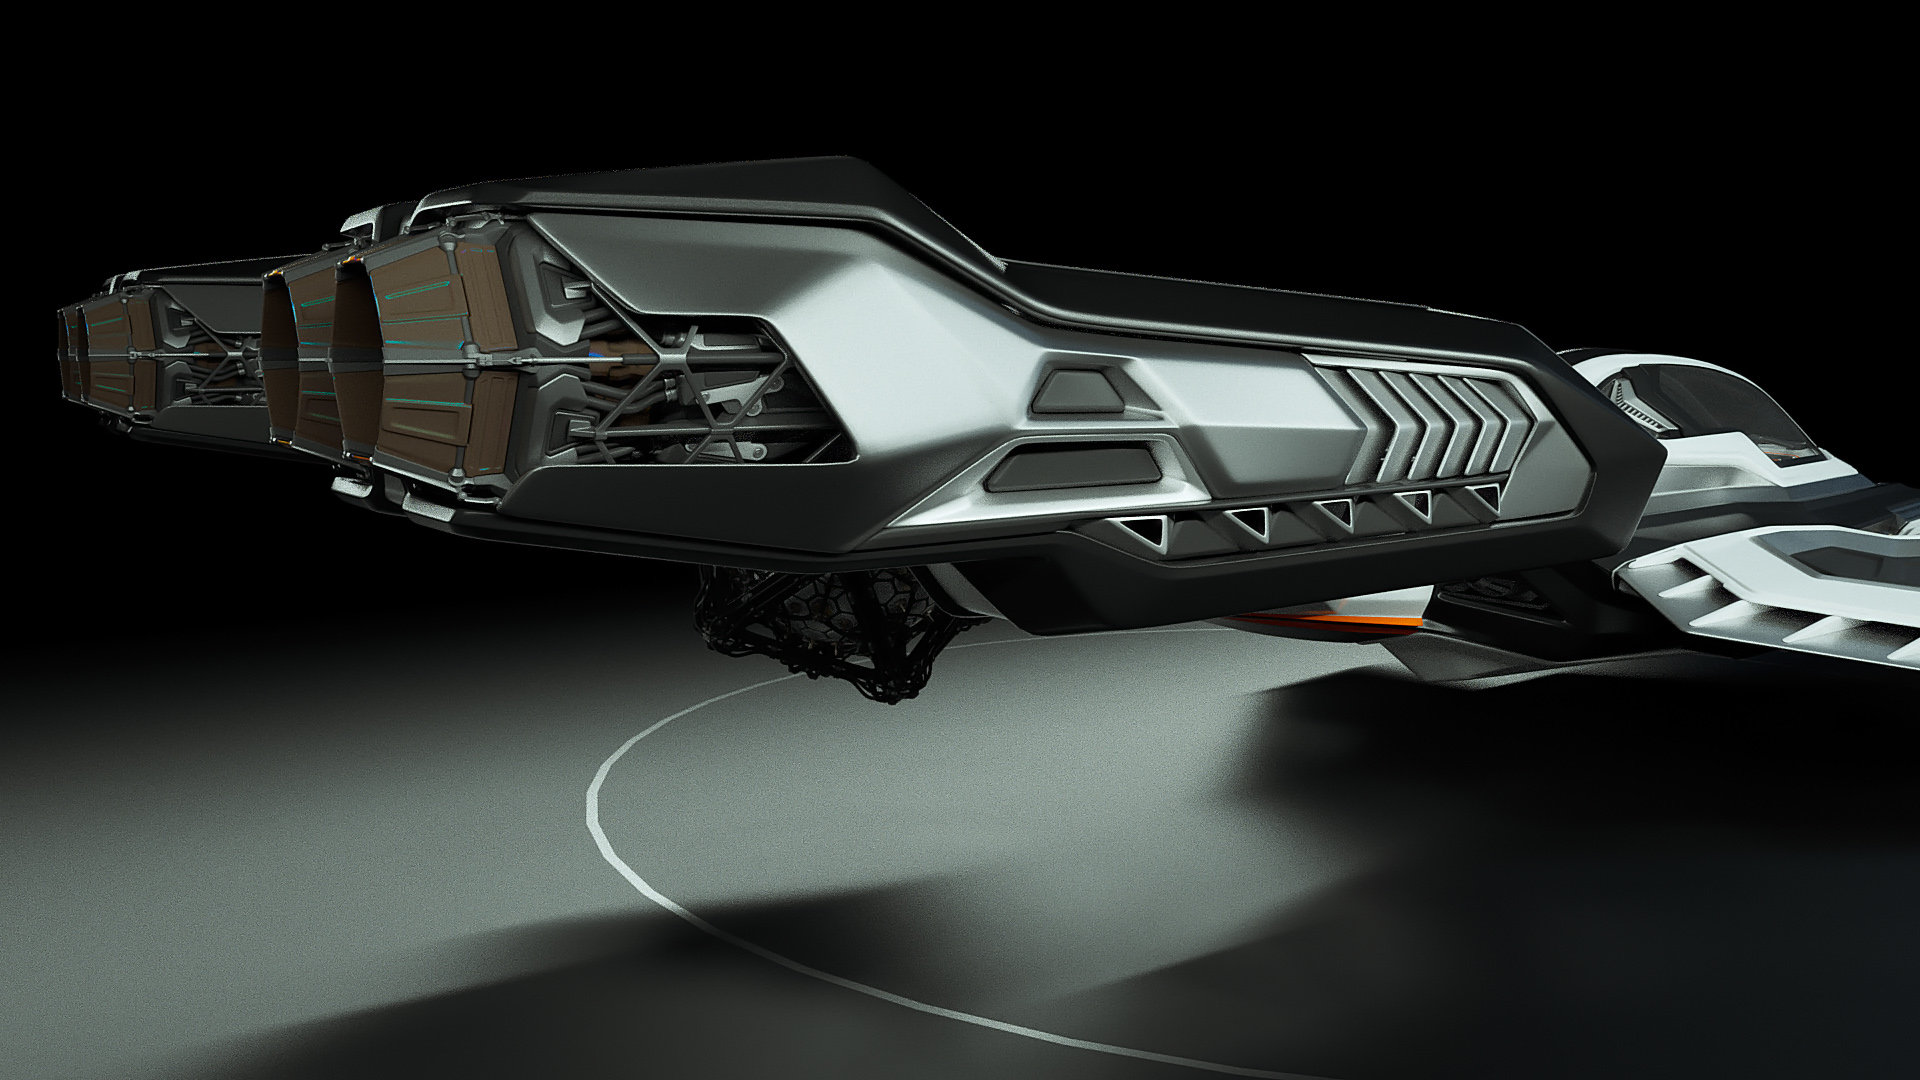 Johan de leenheer 3d spaceship faucer fuga mx230e 07